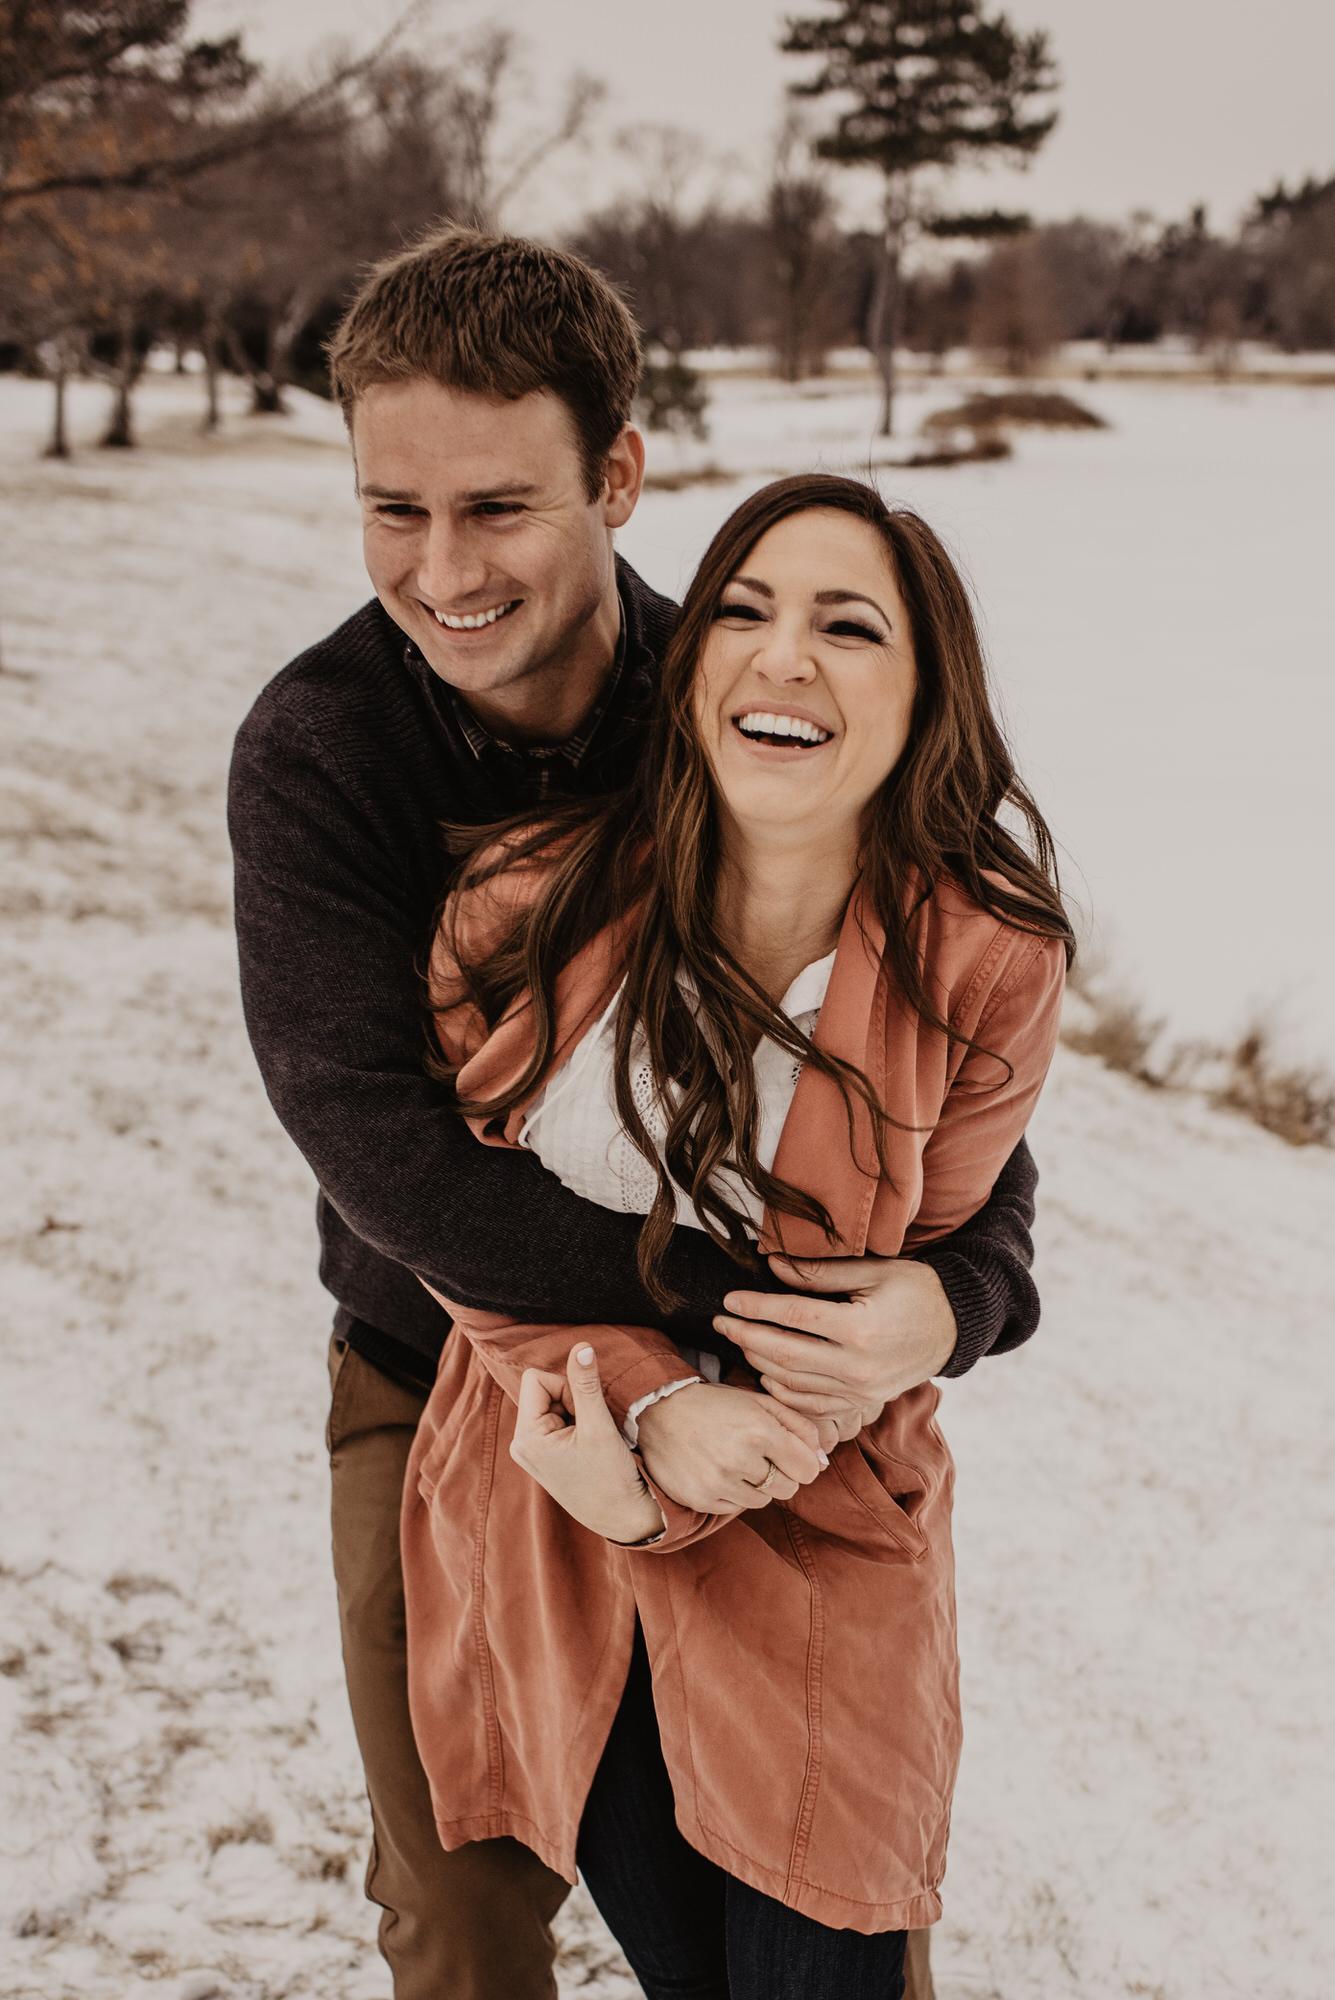 Lincoln-Columbus-Nebraska-Winter-Engagement-Kaylie-Sirek-Photography-13.jpg